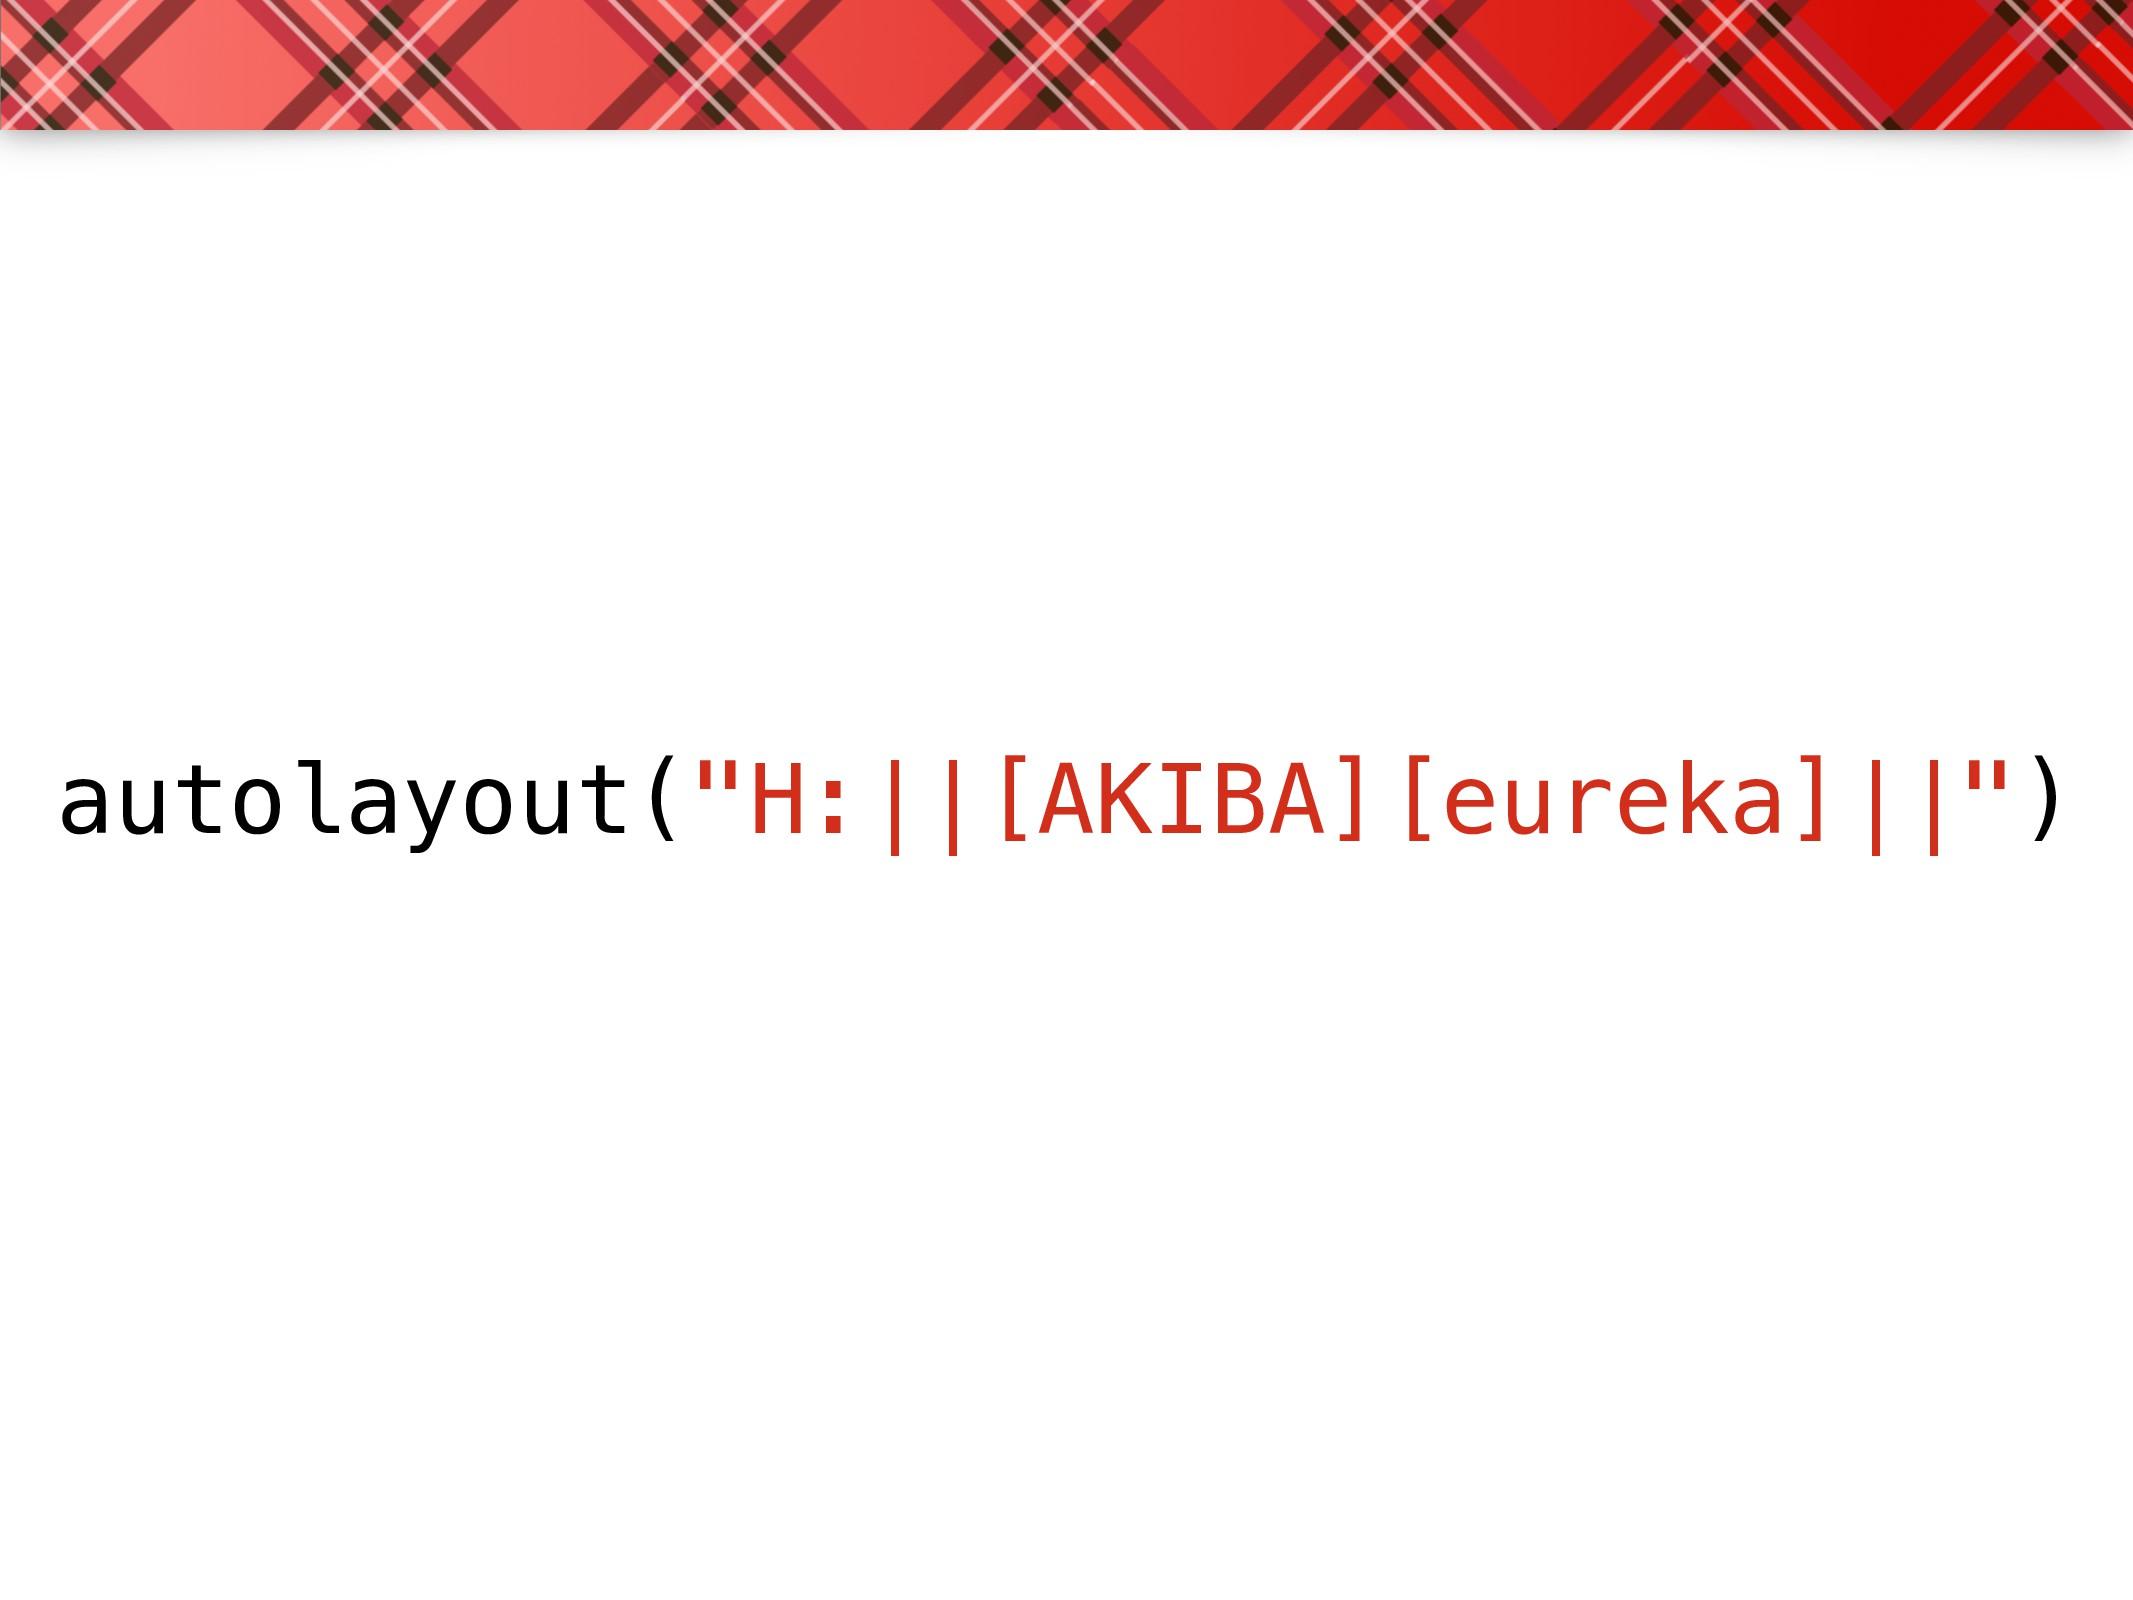 "autolayout(""H:||[AKIBA][eureka]||"")"